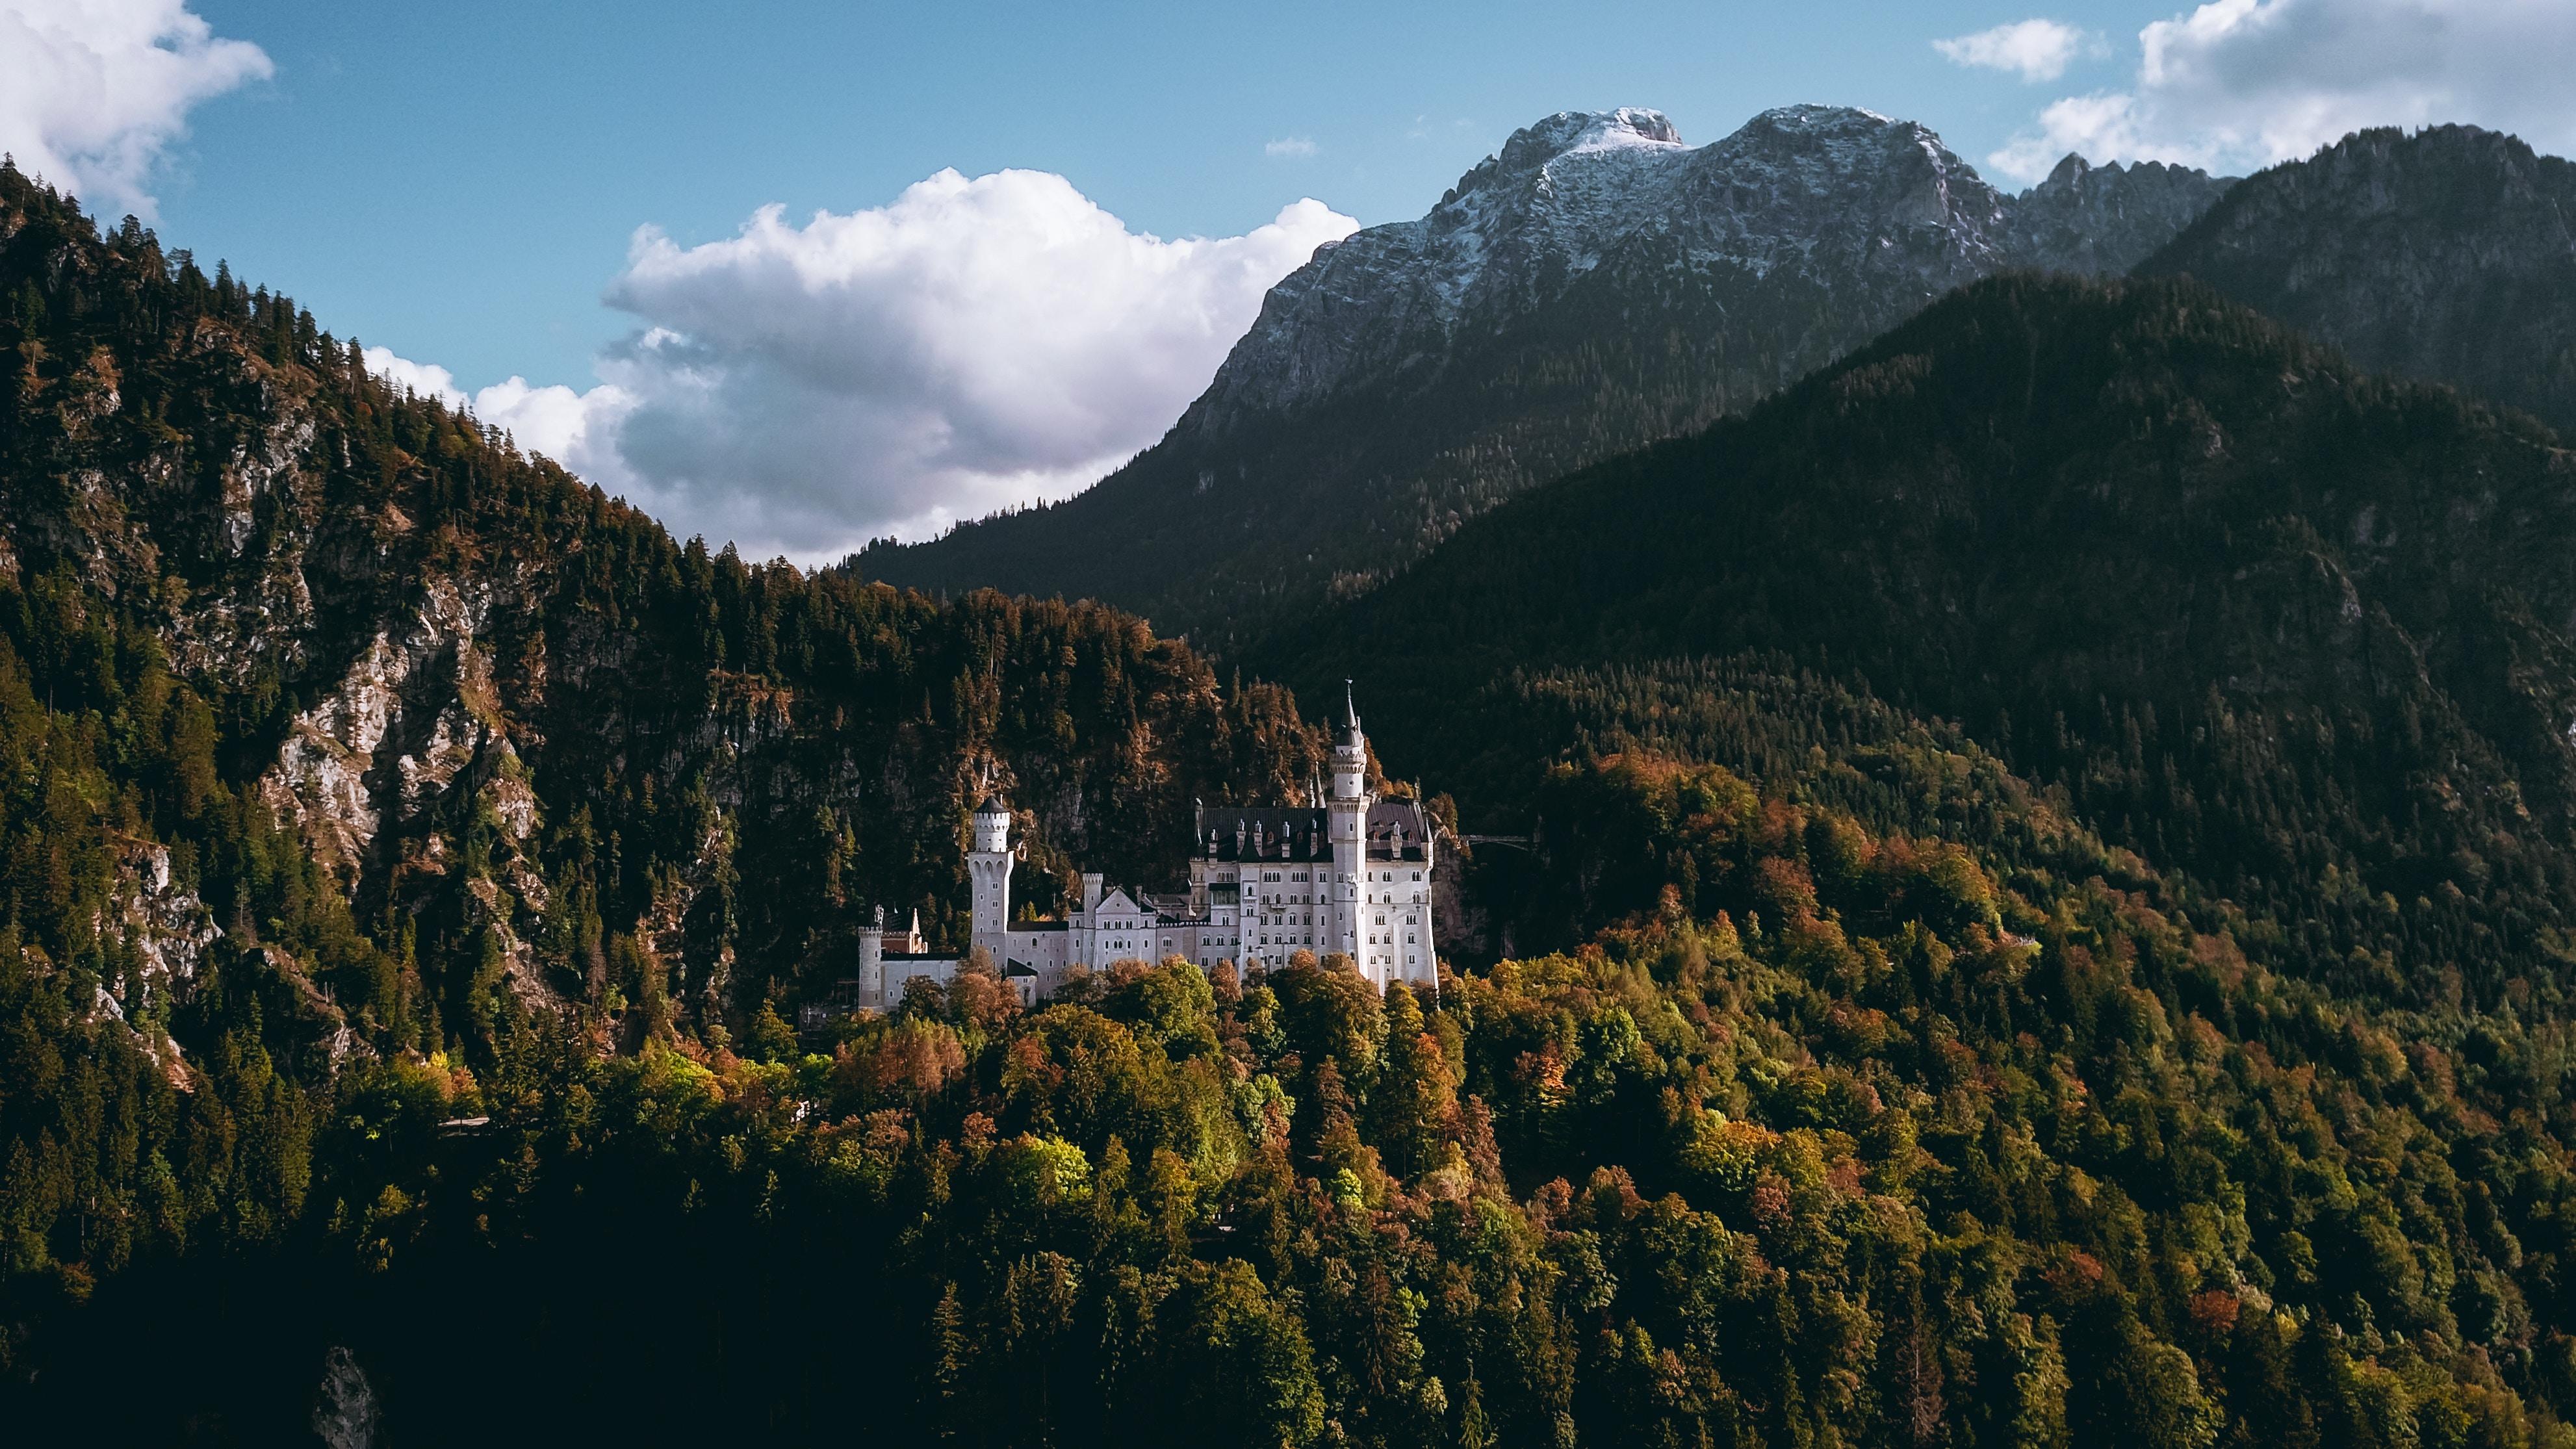 General 3964x2230 landscape forest mountains castle clouds Neuschwanstein Castle Germany